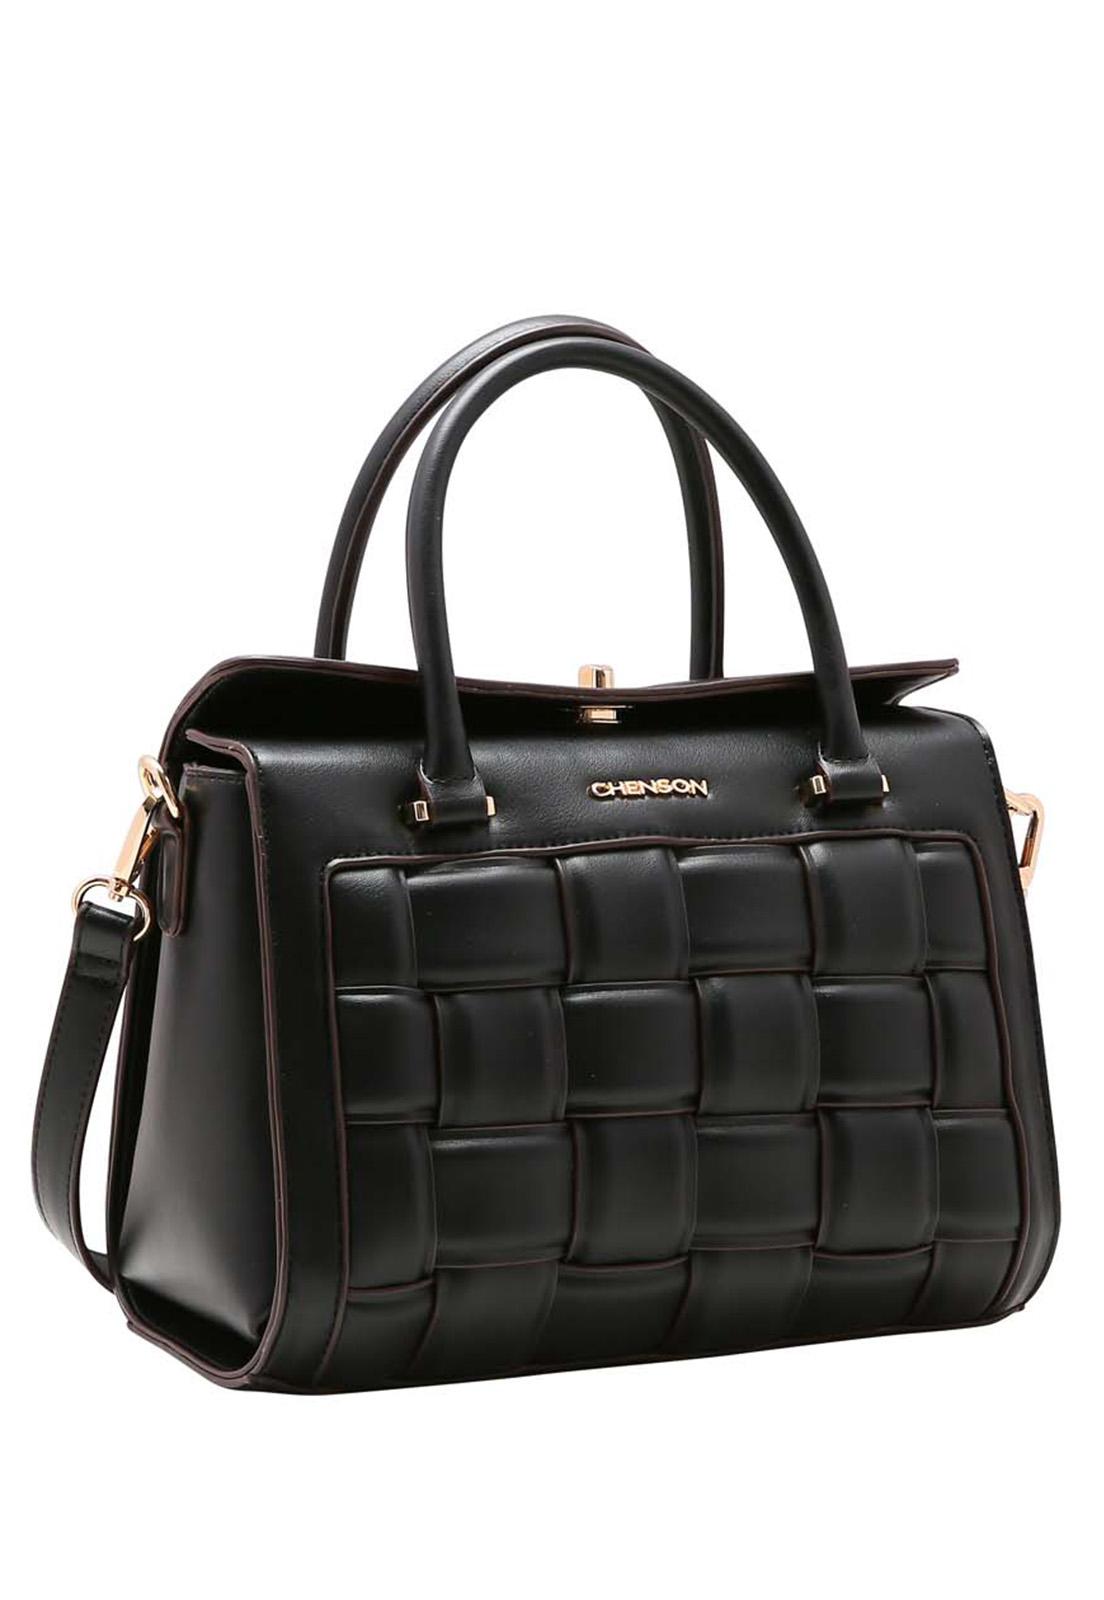 Bolsa Feminina Chenson Max Tressê Mão 3483563